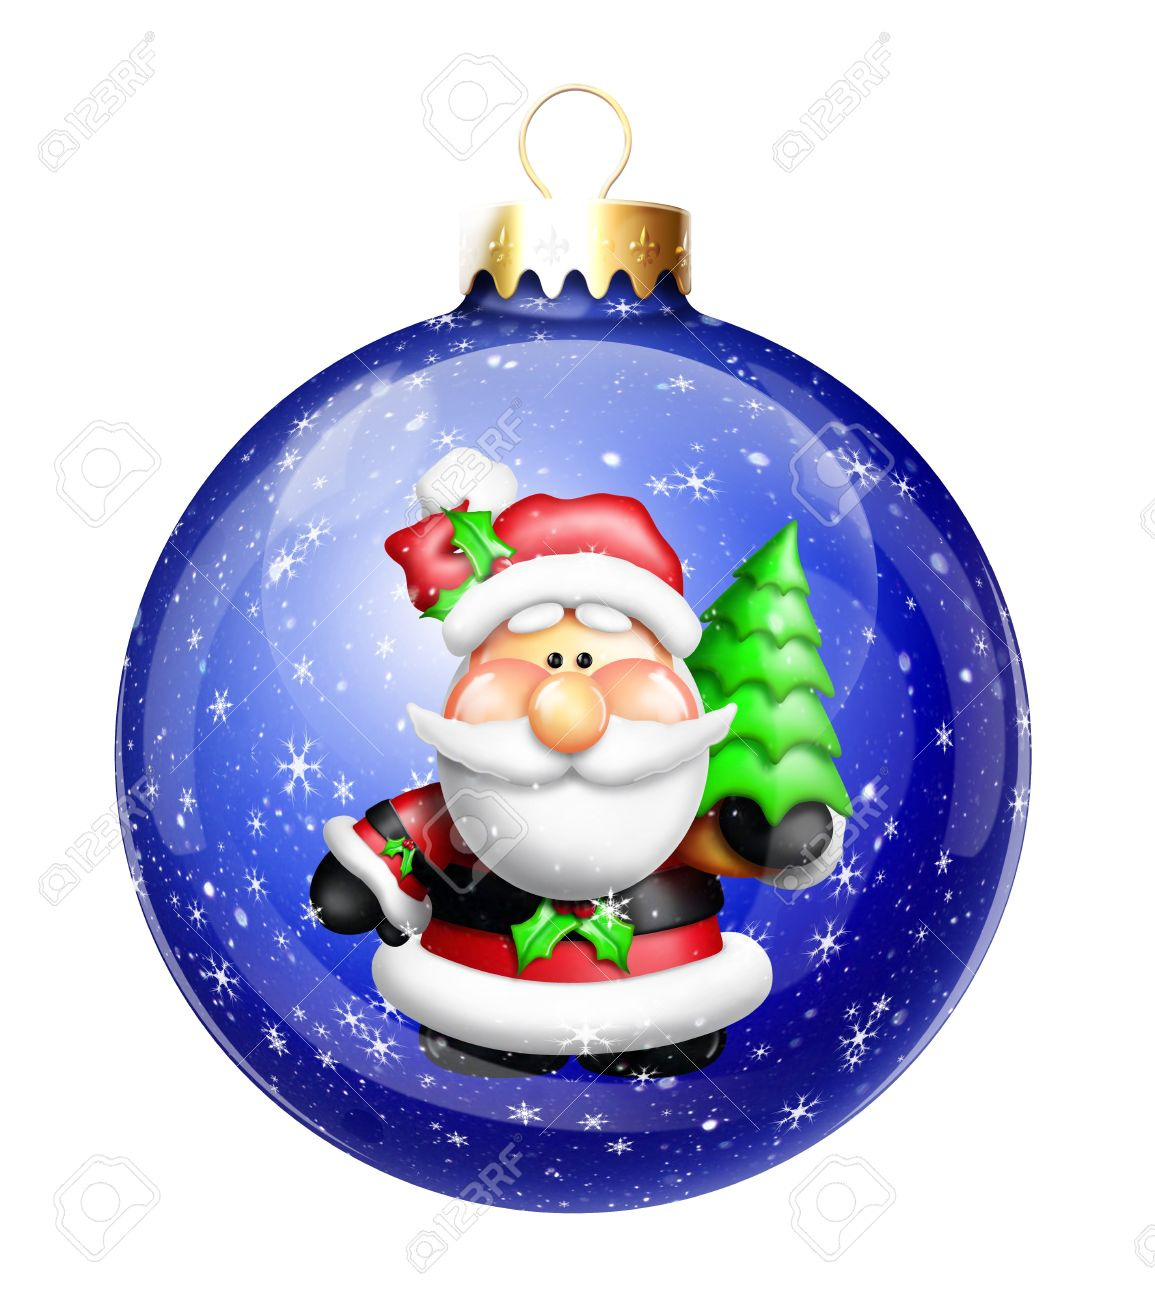 Christmas ball ornament clipart.